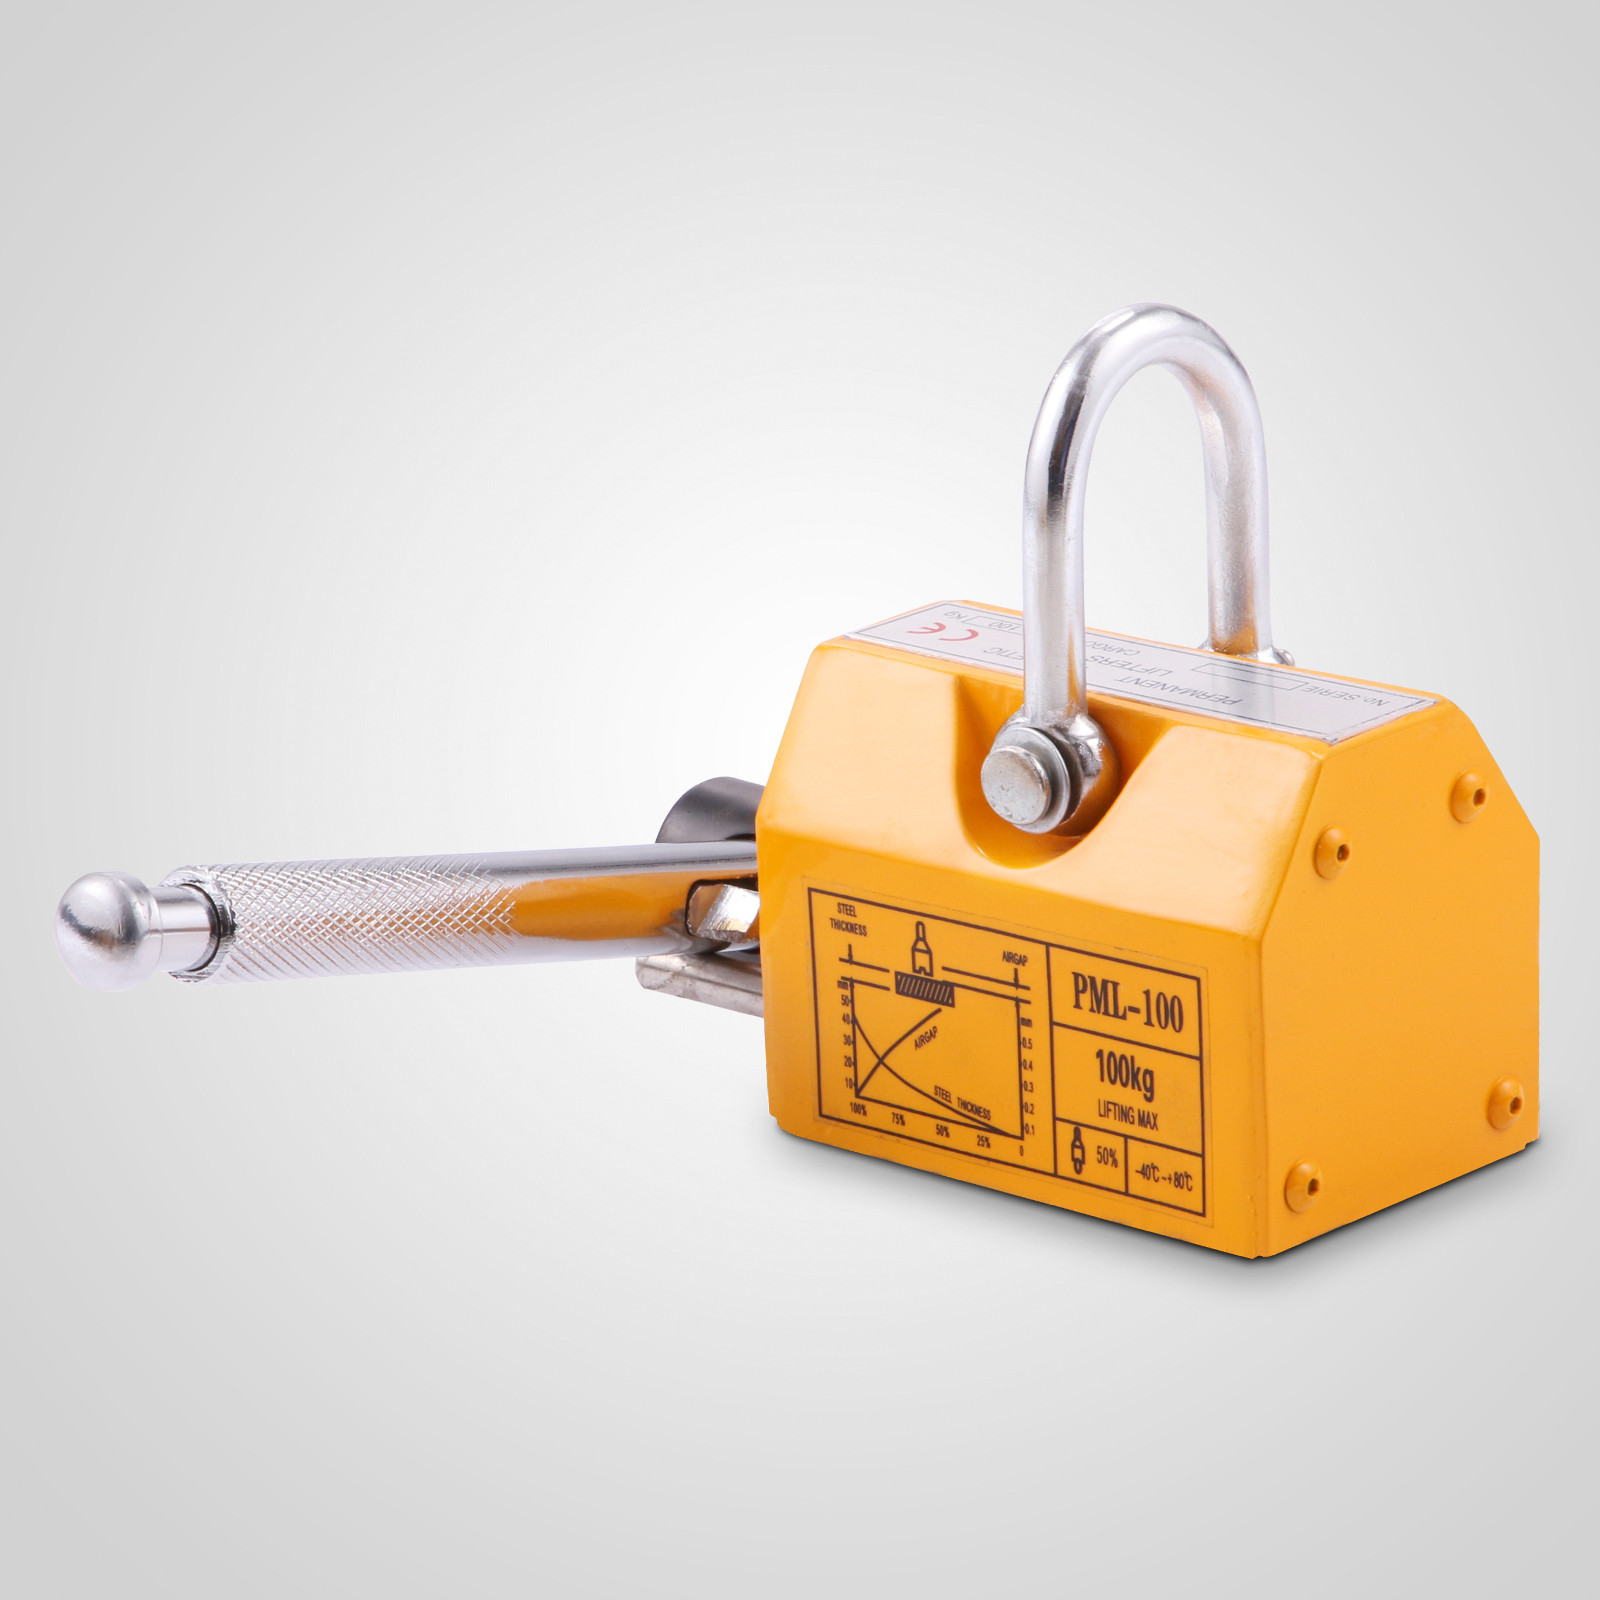 100-300-600-1000KG-Steel-Magnetic-Lifter-Heavy-Duty-Crane-Hoist-Lifting-Magnet miniature 19